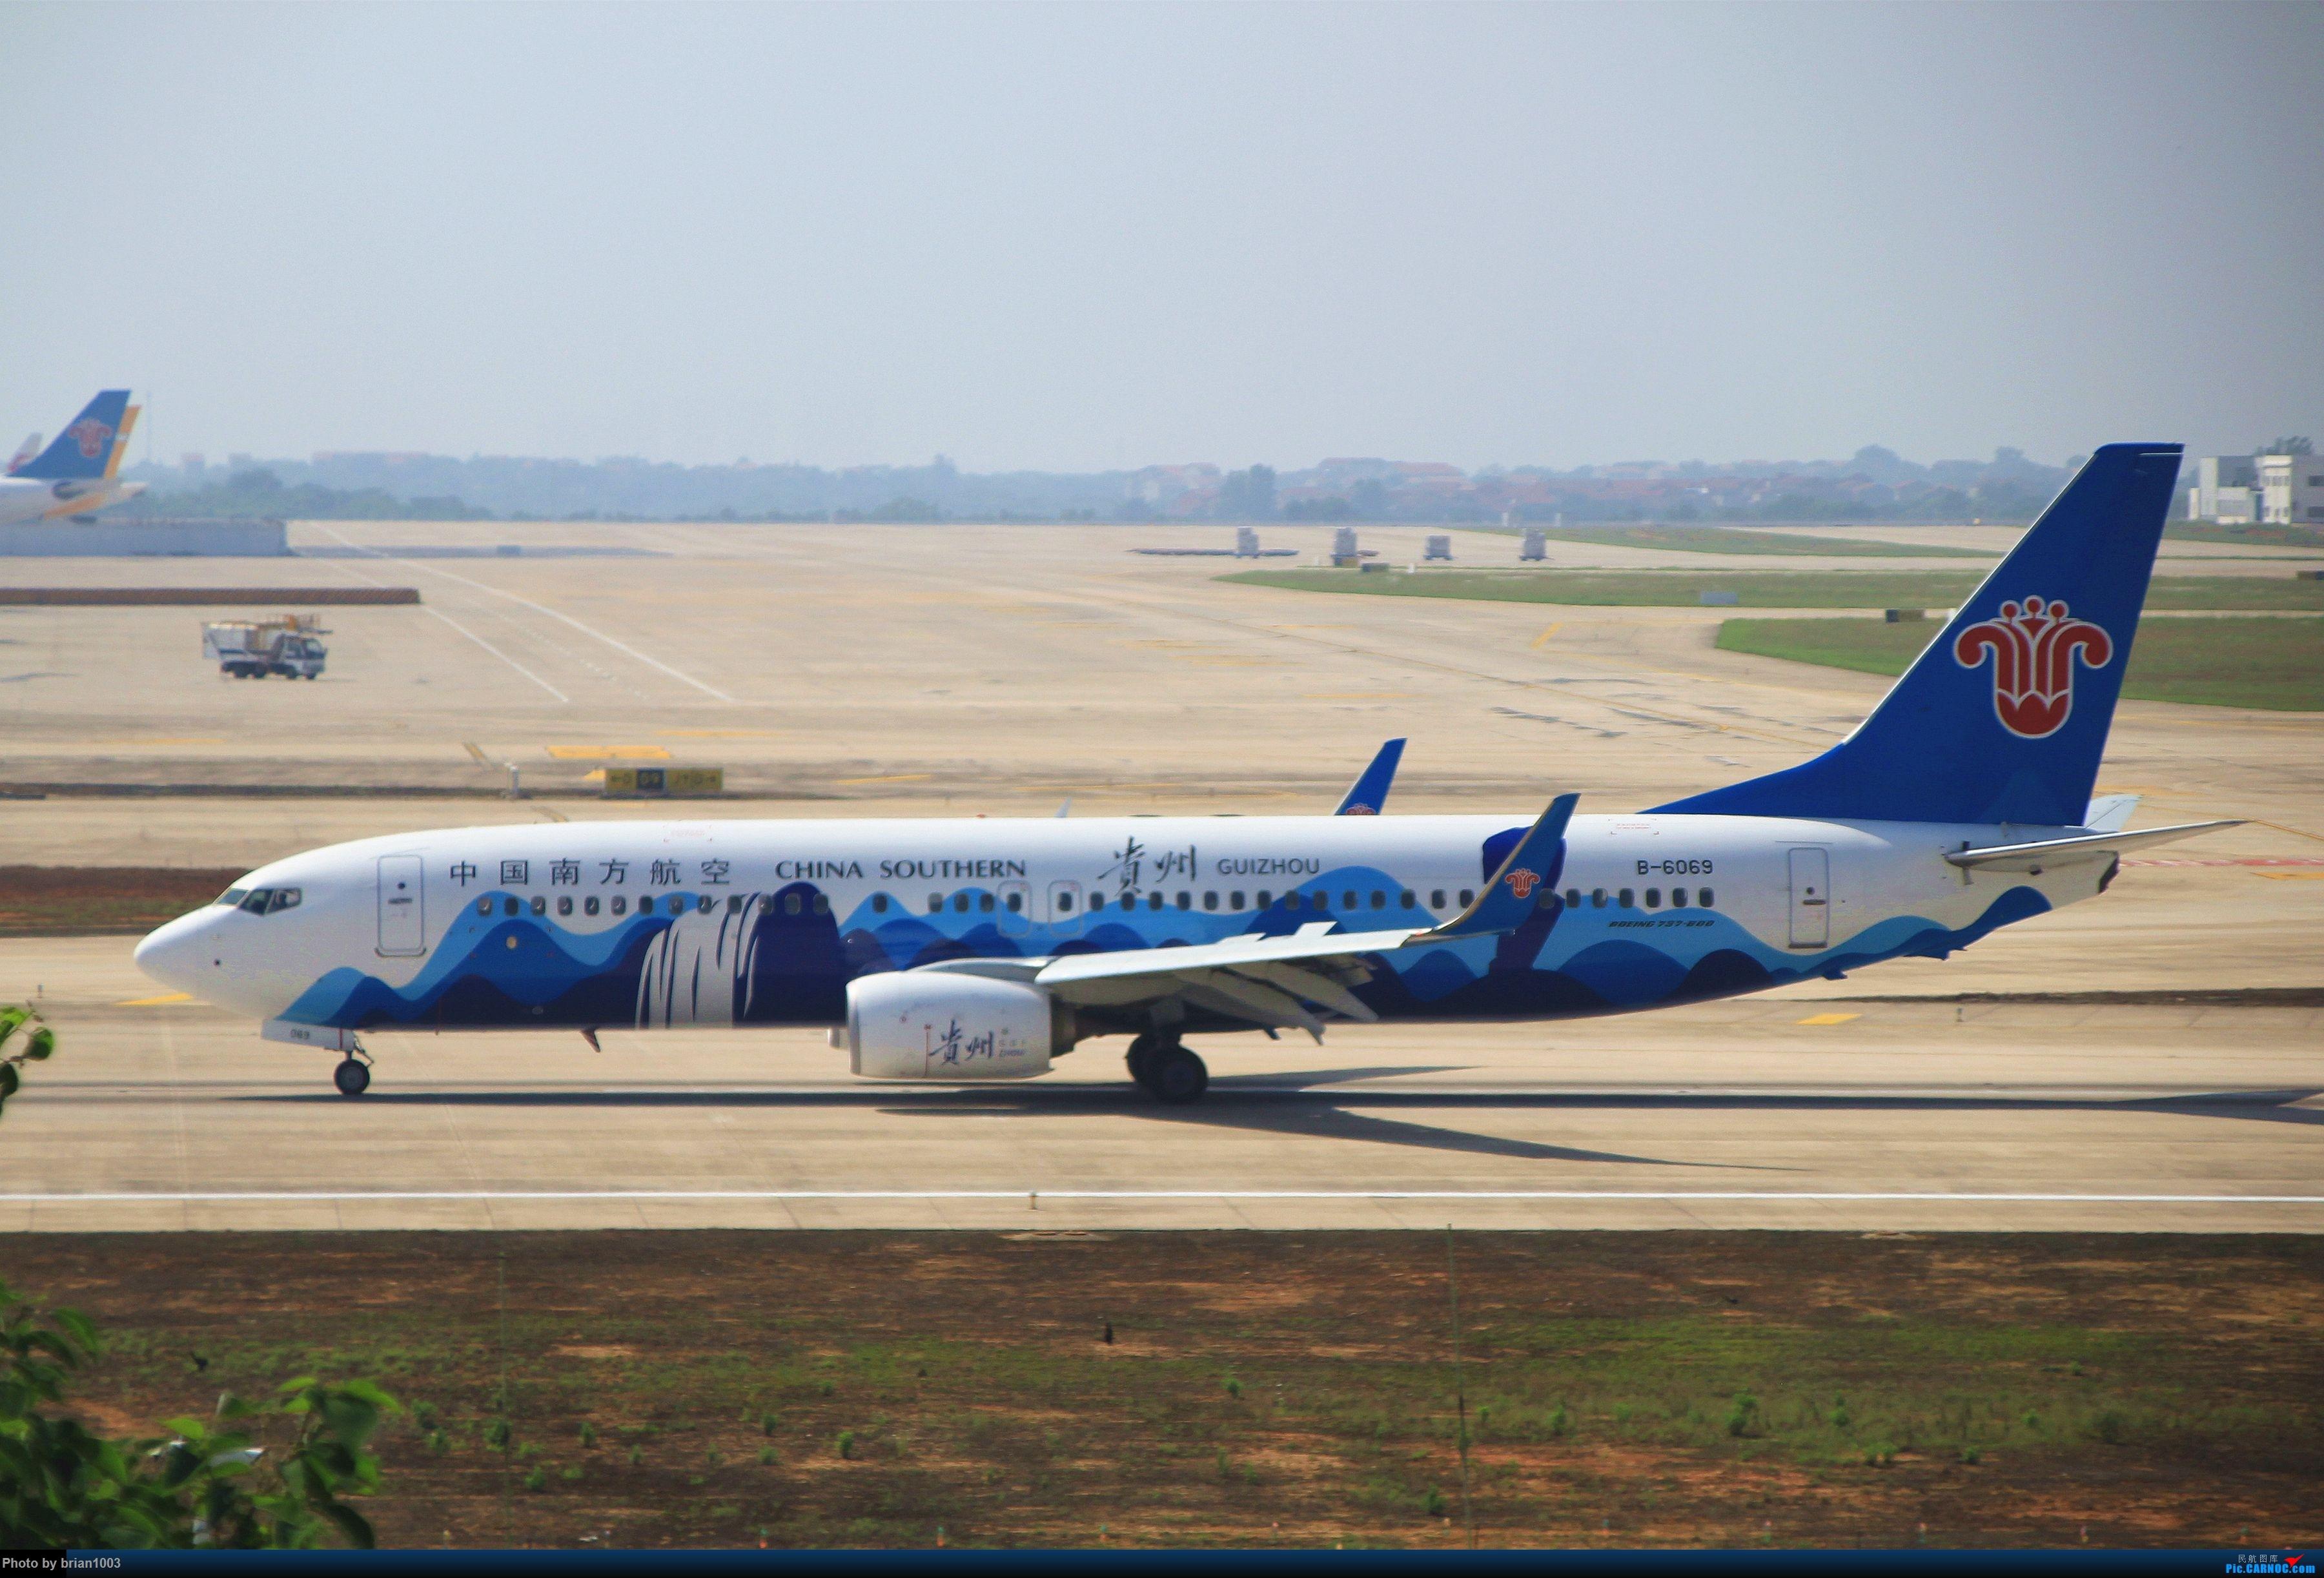 Re:[原创]WUH武汉天河机场拍机之喜迎酷航788和偶遇某其他飞机 BOEING 737-800 B-6069